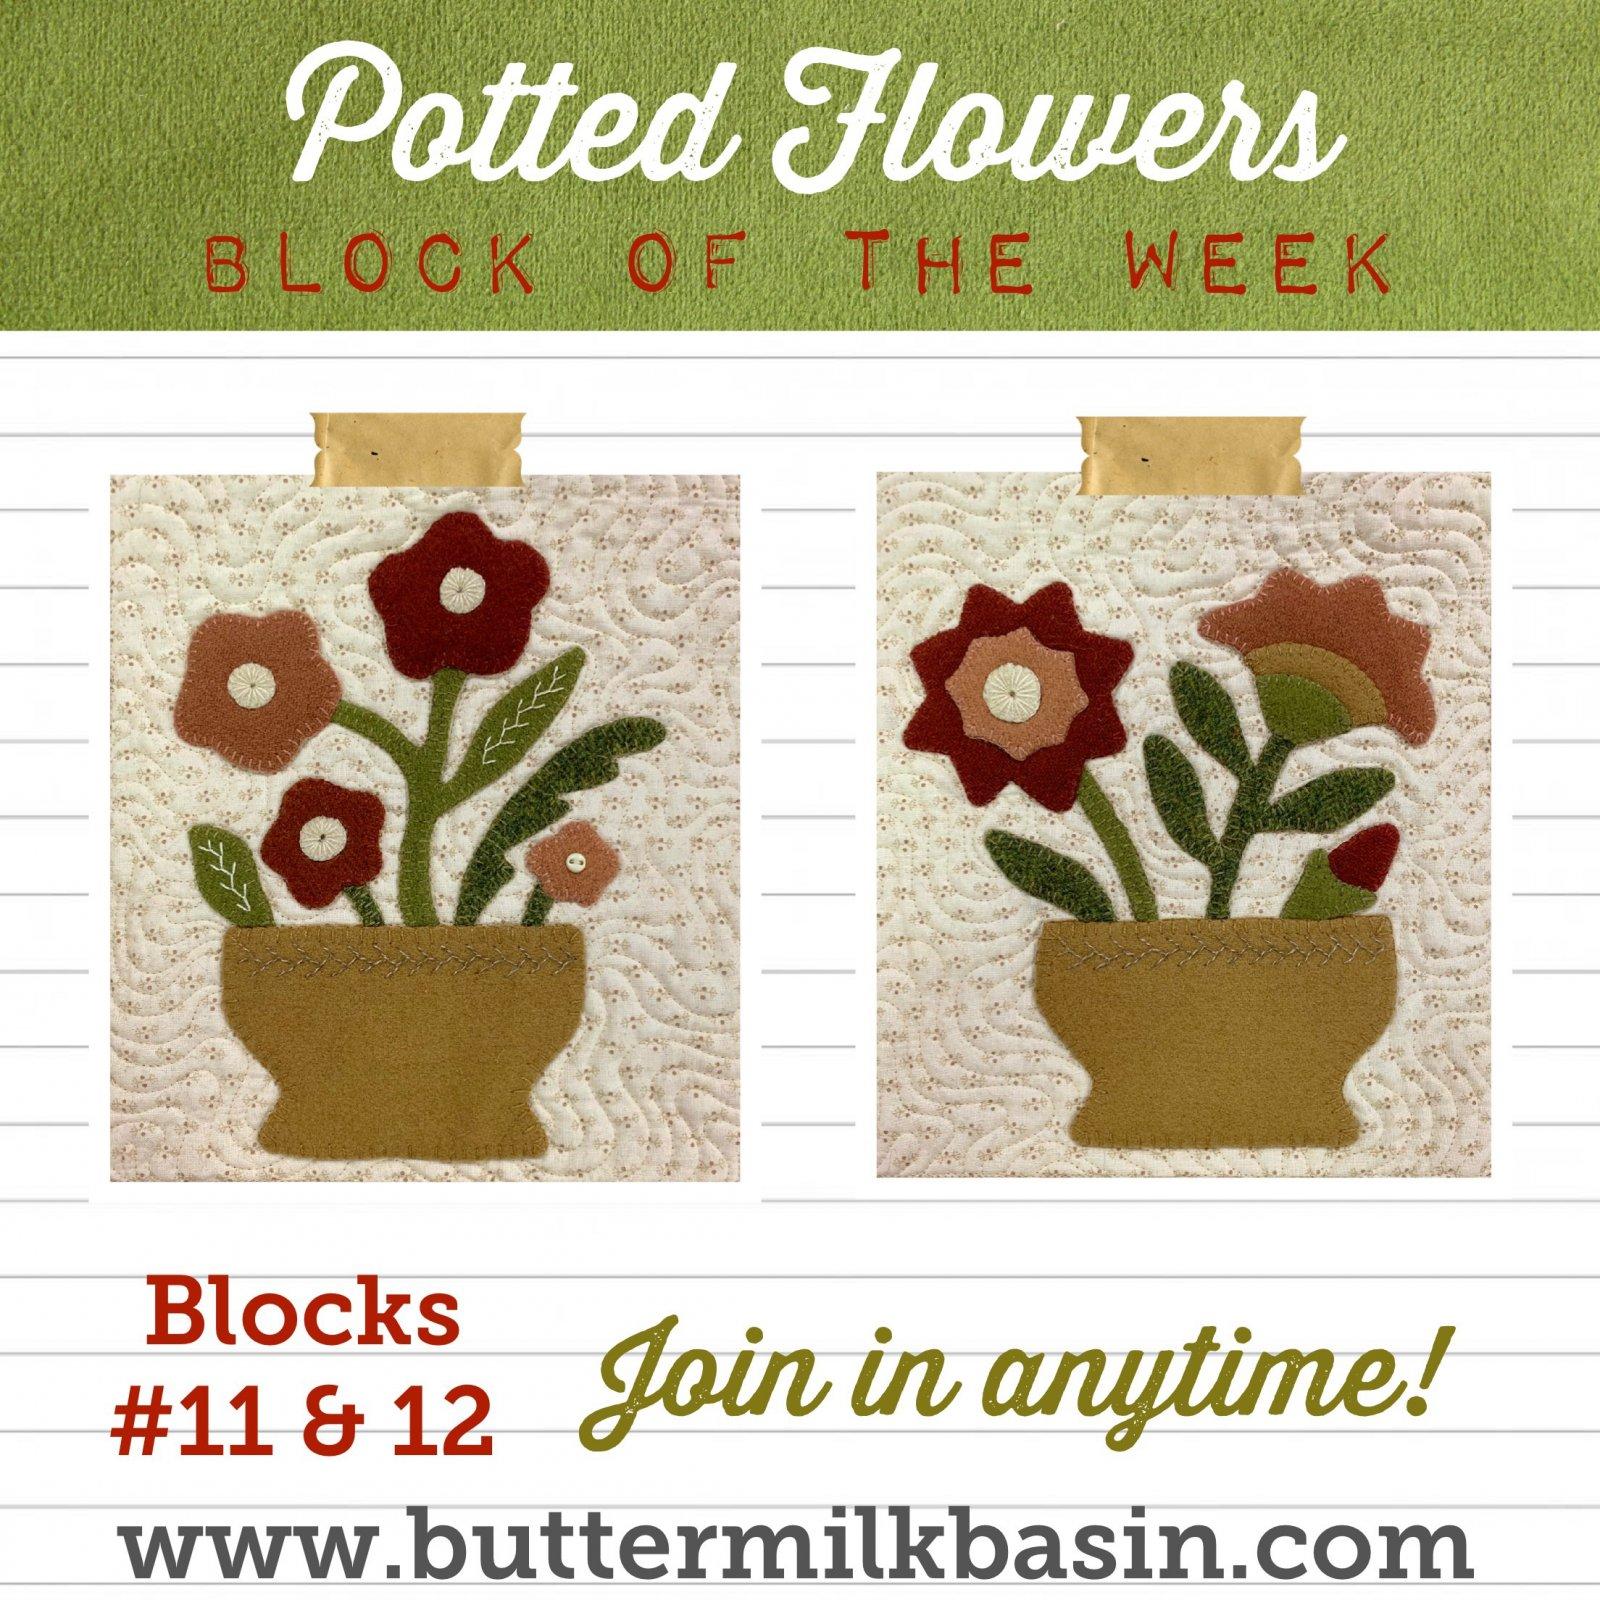 Vintage Potted Flowers Quilt Block of the Week *Blocks 11 & 12 Pattern & Kit